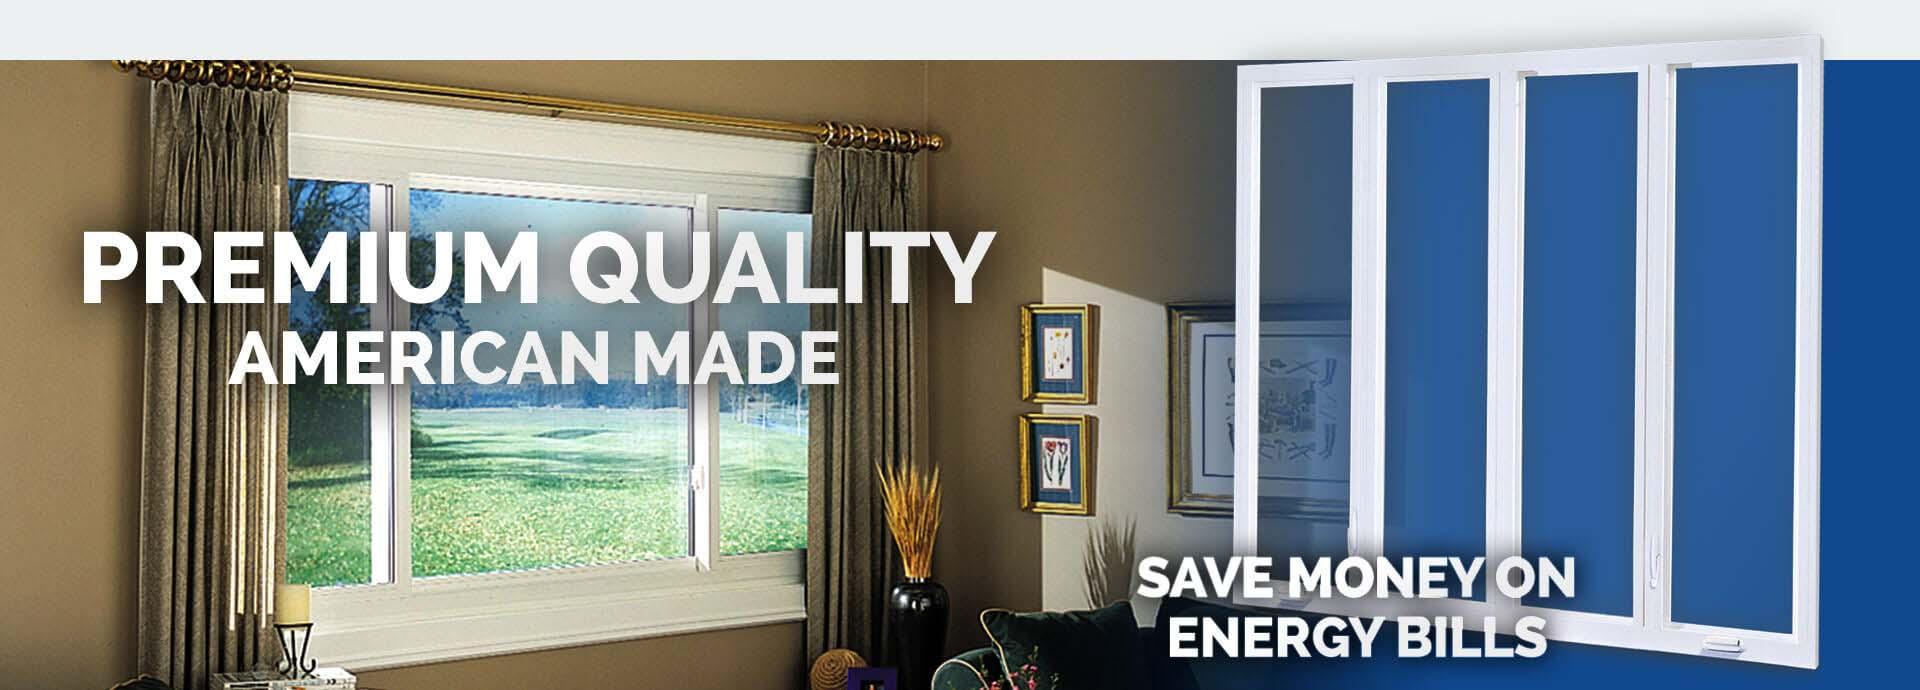 Replacement Windows, Siding & Doors Tampa FL | Window World of Tampa